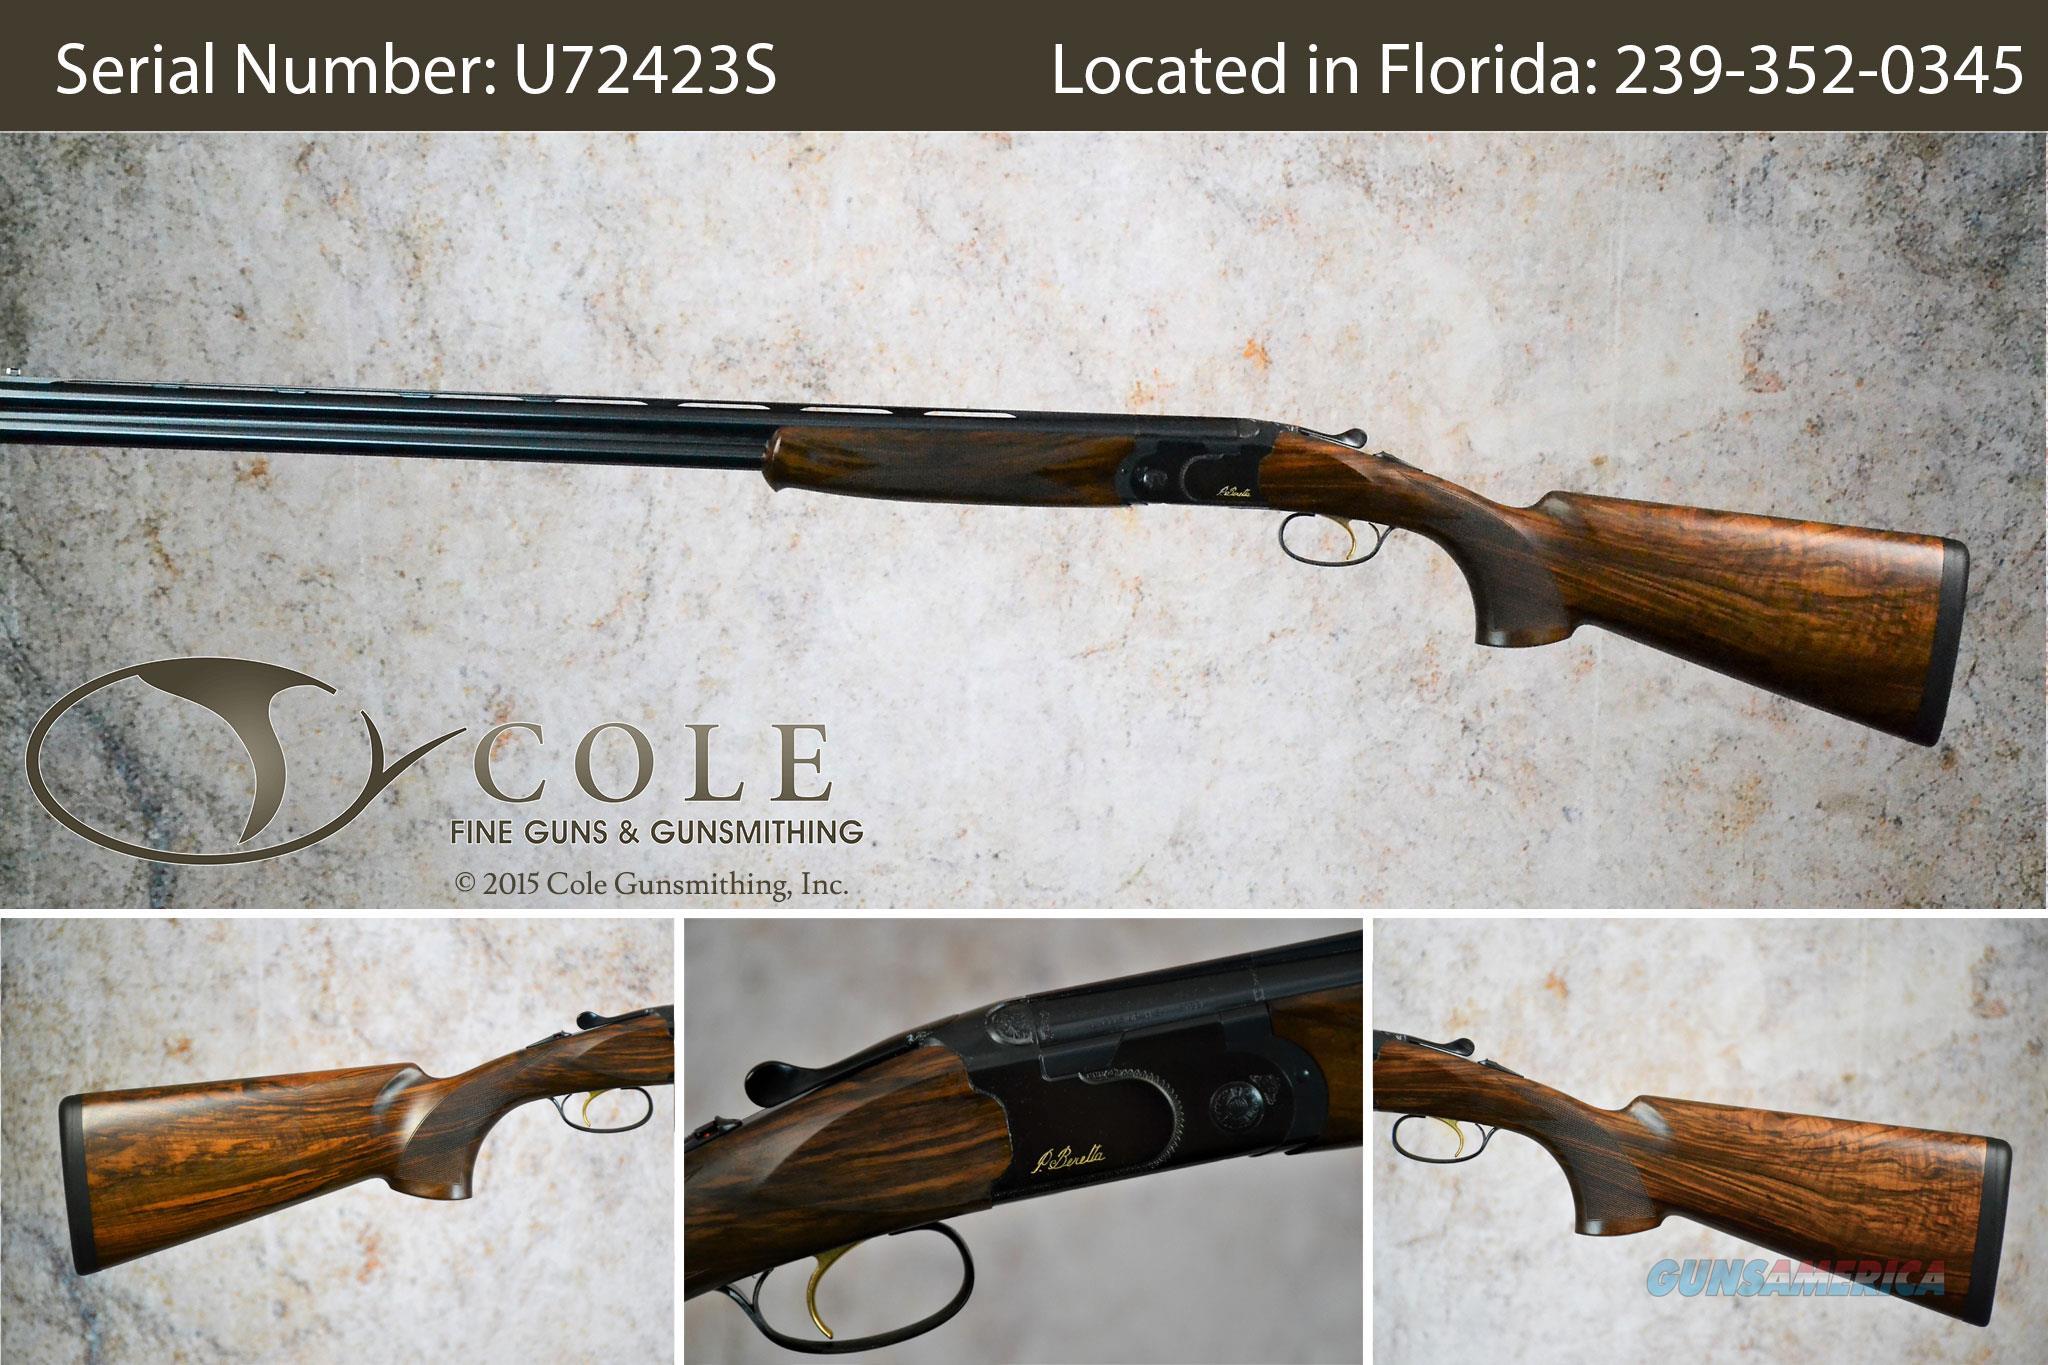 "Beretta 686 Onyx Pro Sporting 20g 30"" SN:#U72423S  Guns > Shotguns > Beretta Shotguns > O/U > Trap/Skeet"